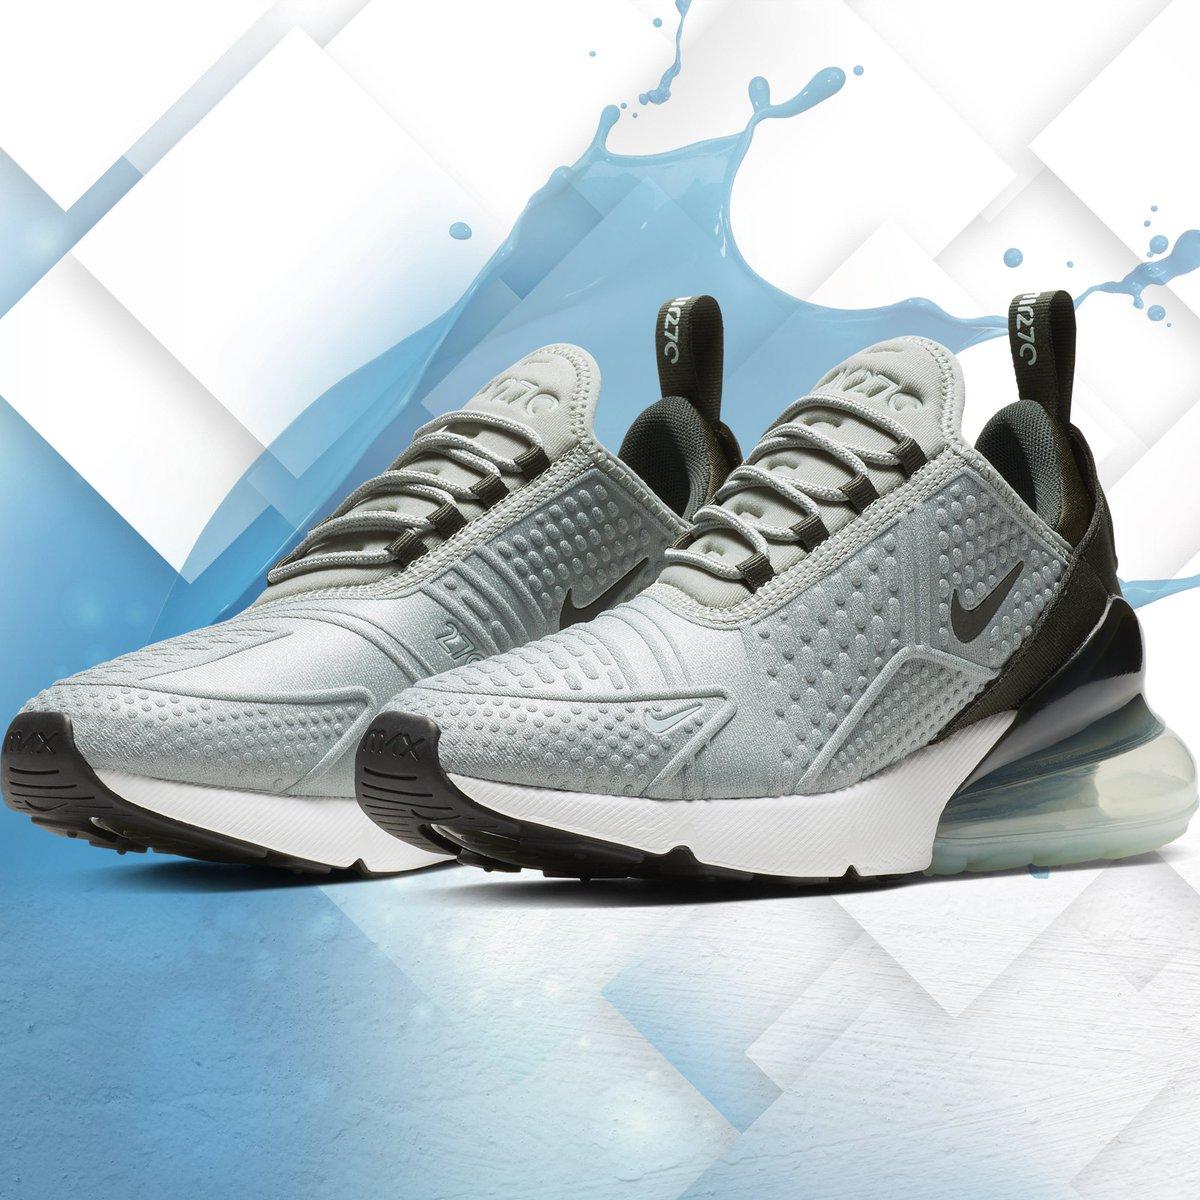 heißer verkauf GB'S Sneaker Shop على تويتر: Nike Air Max 270